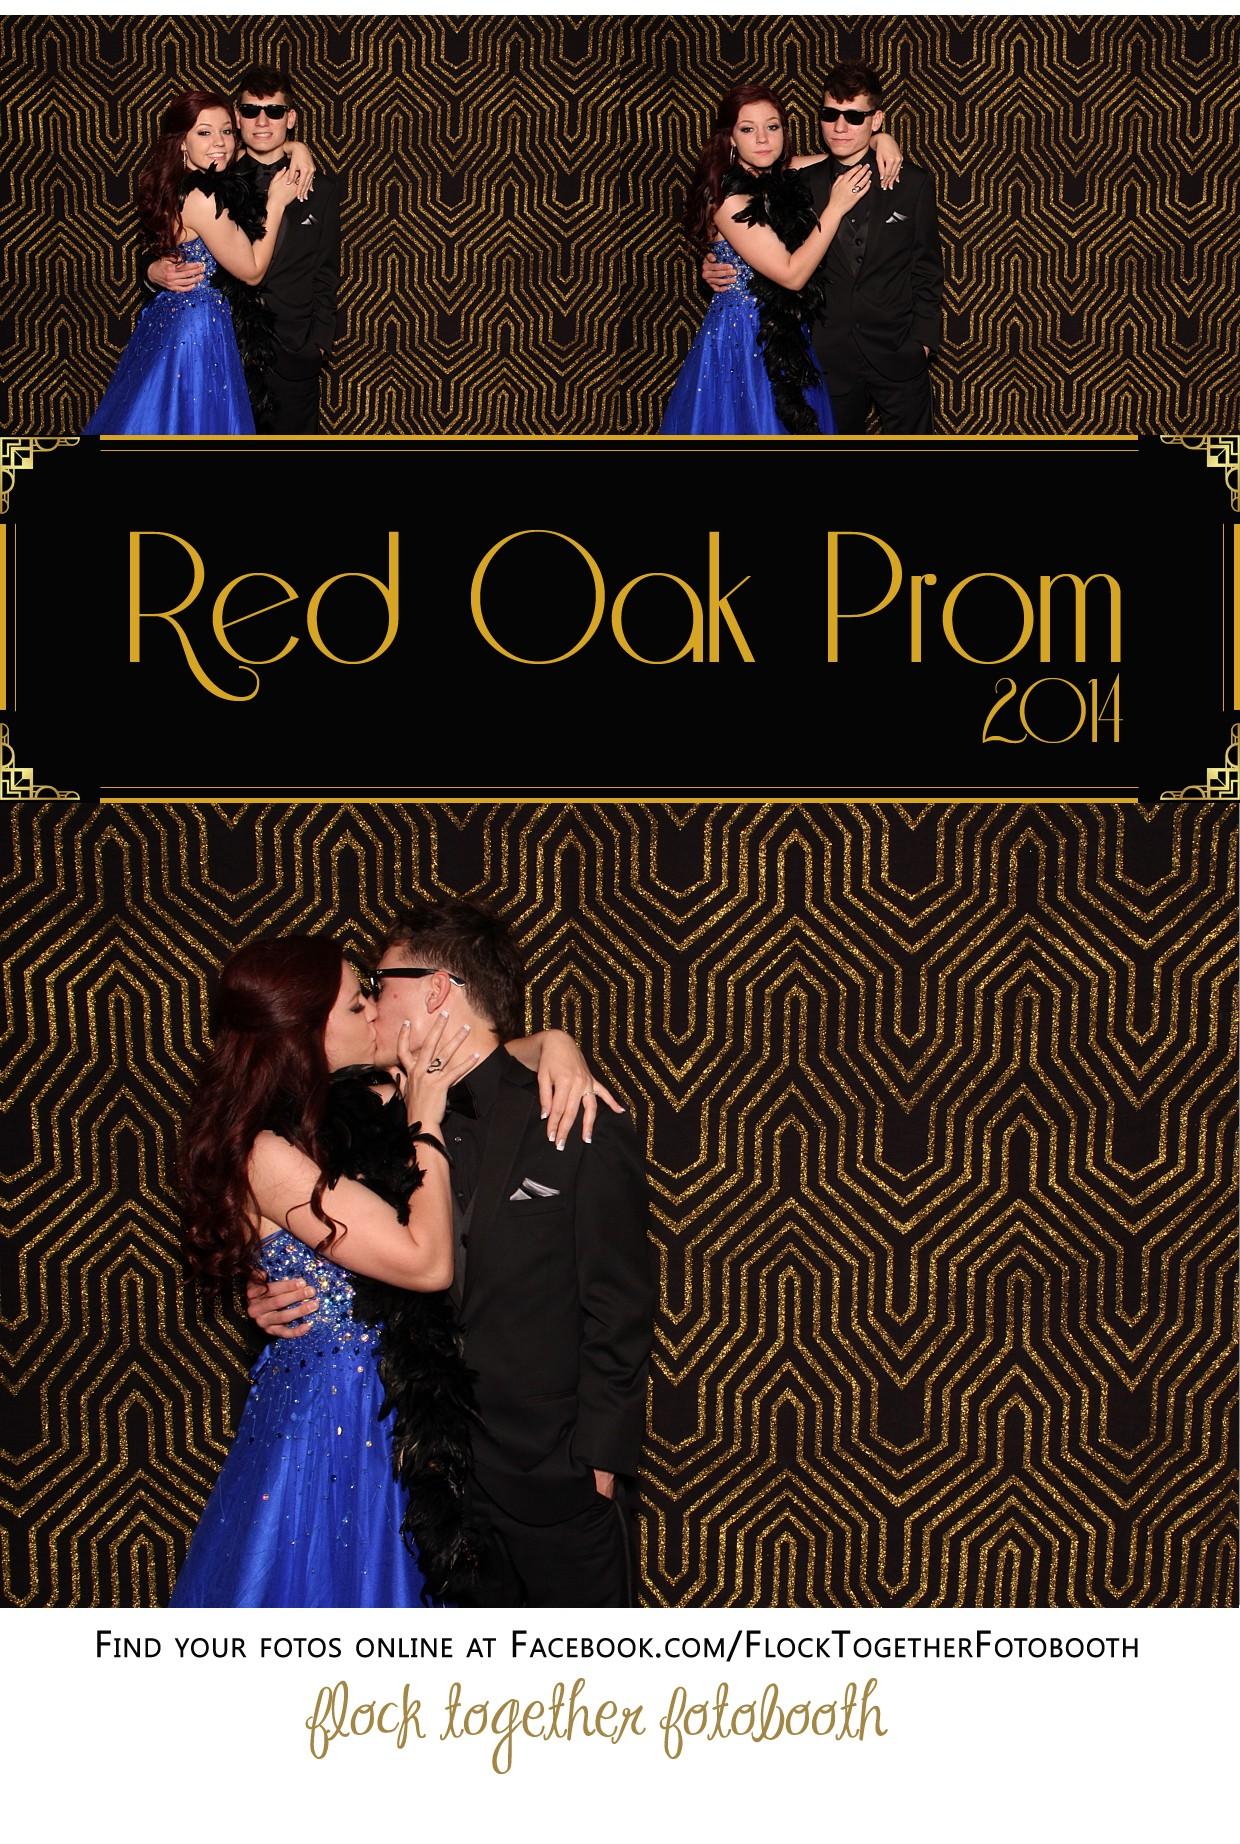 Prom photo booth in Dallas Texas